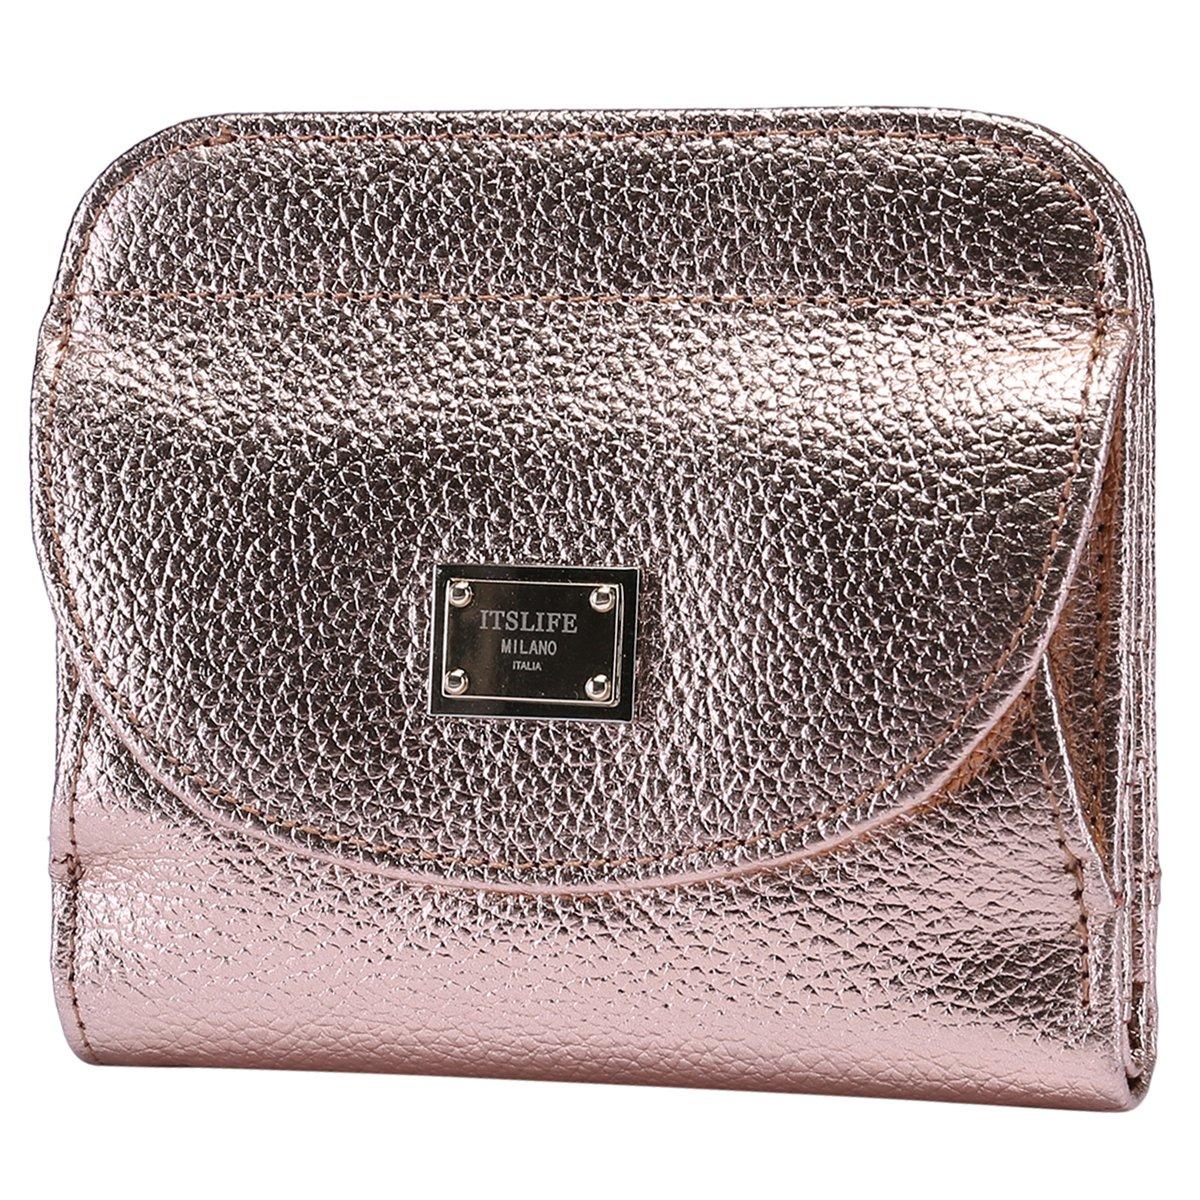 Itslife Women's Rfid Blocking Luxury Leather Wallet Slim Travel Wallet for Ladies